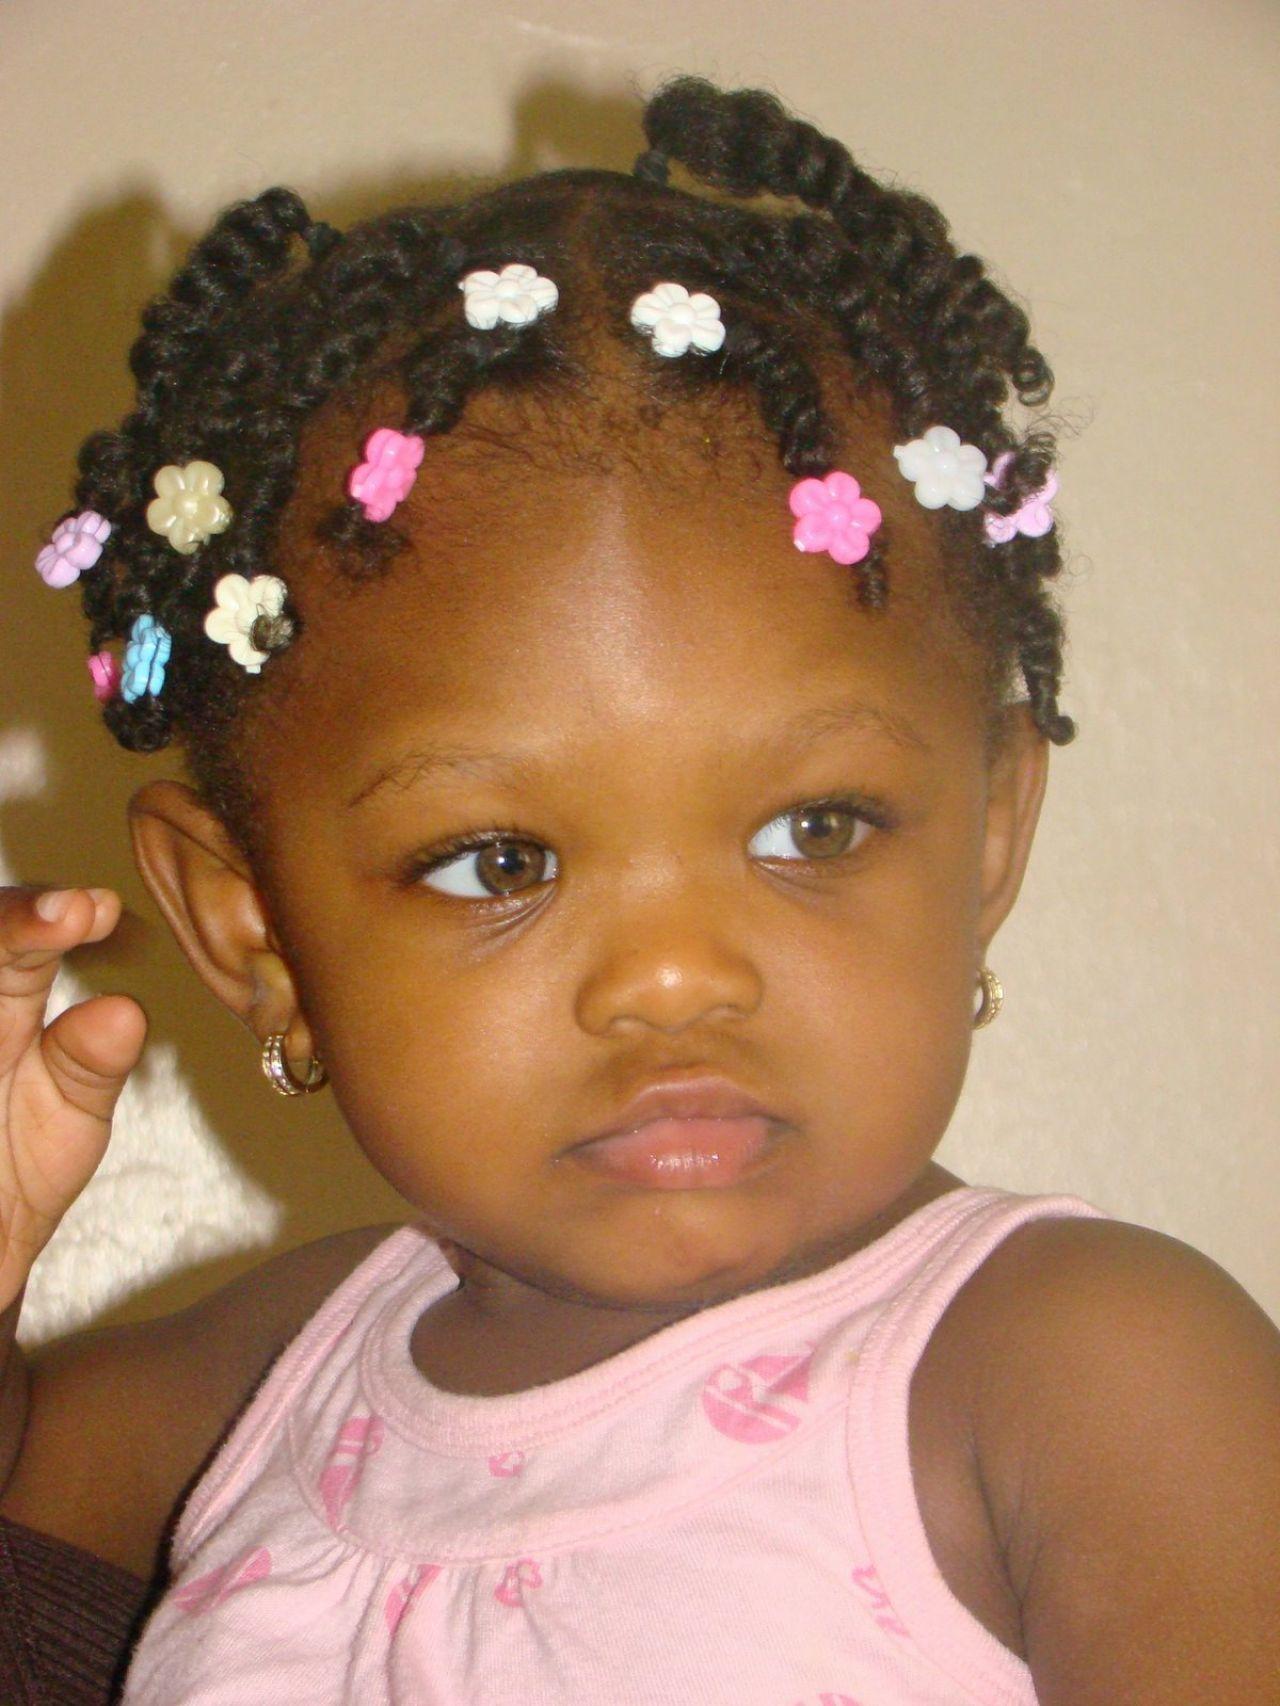 208 Braided Mohawk Hairstyles for Little Girls Little